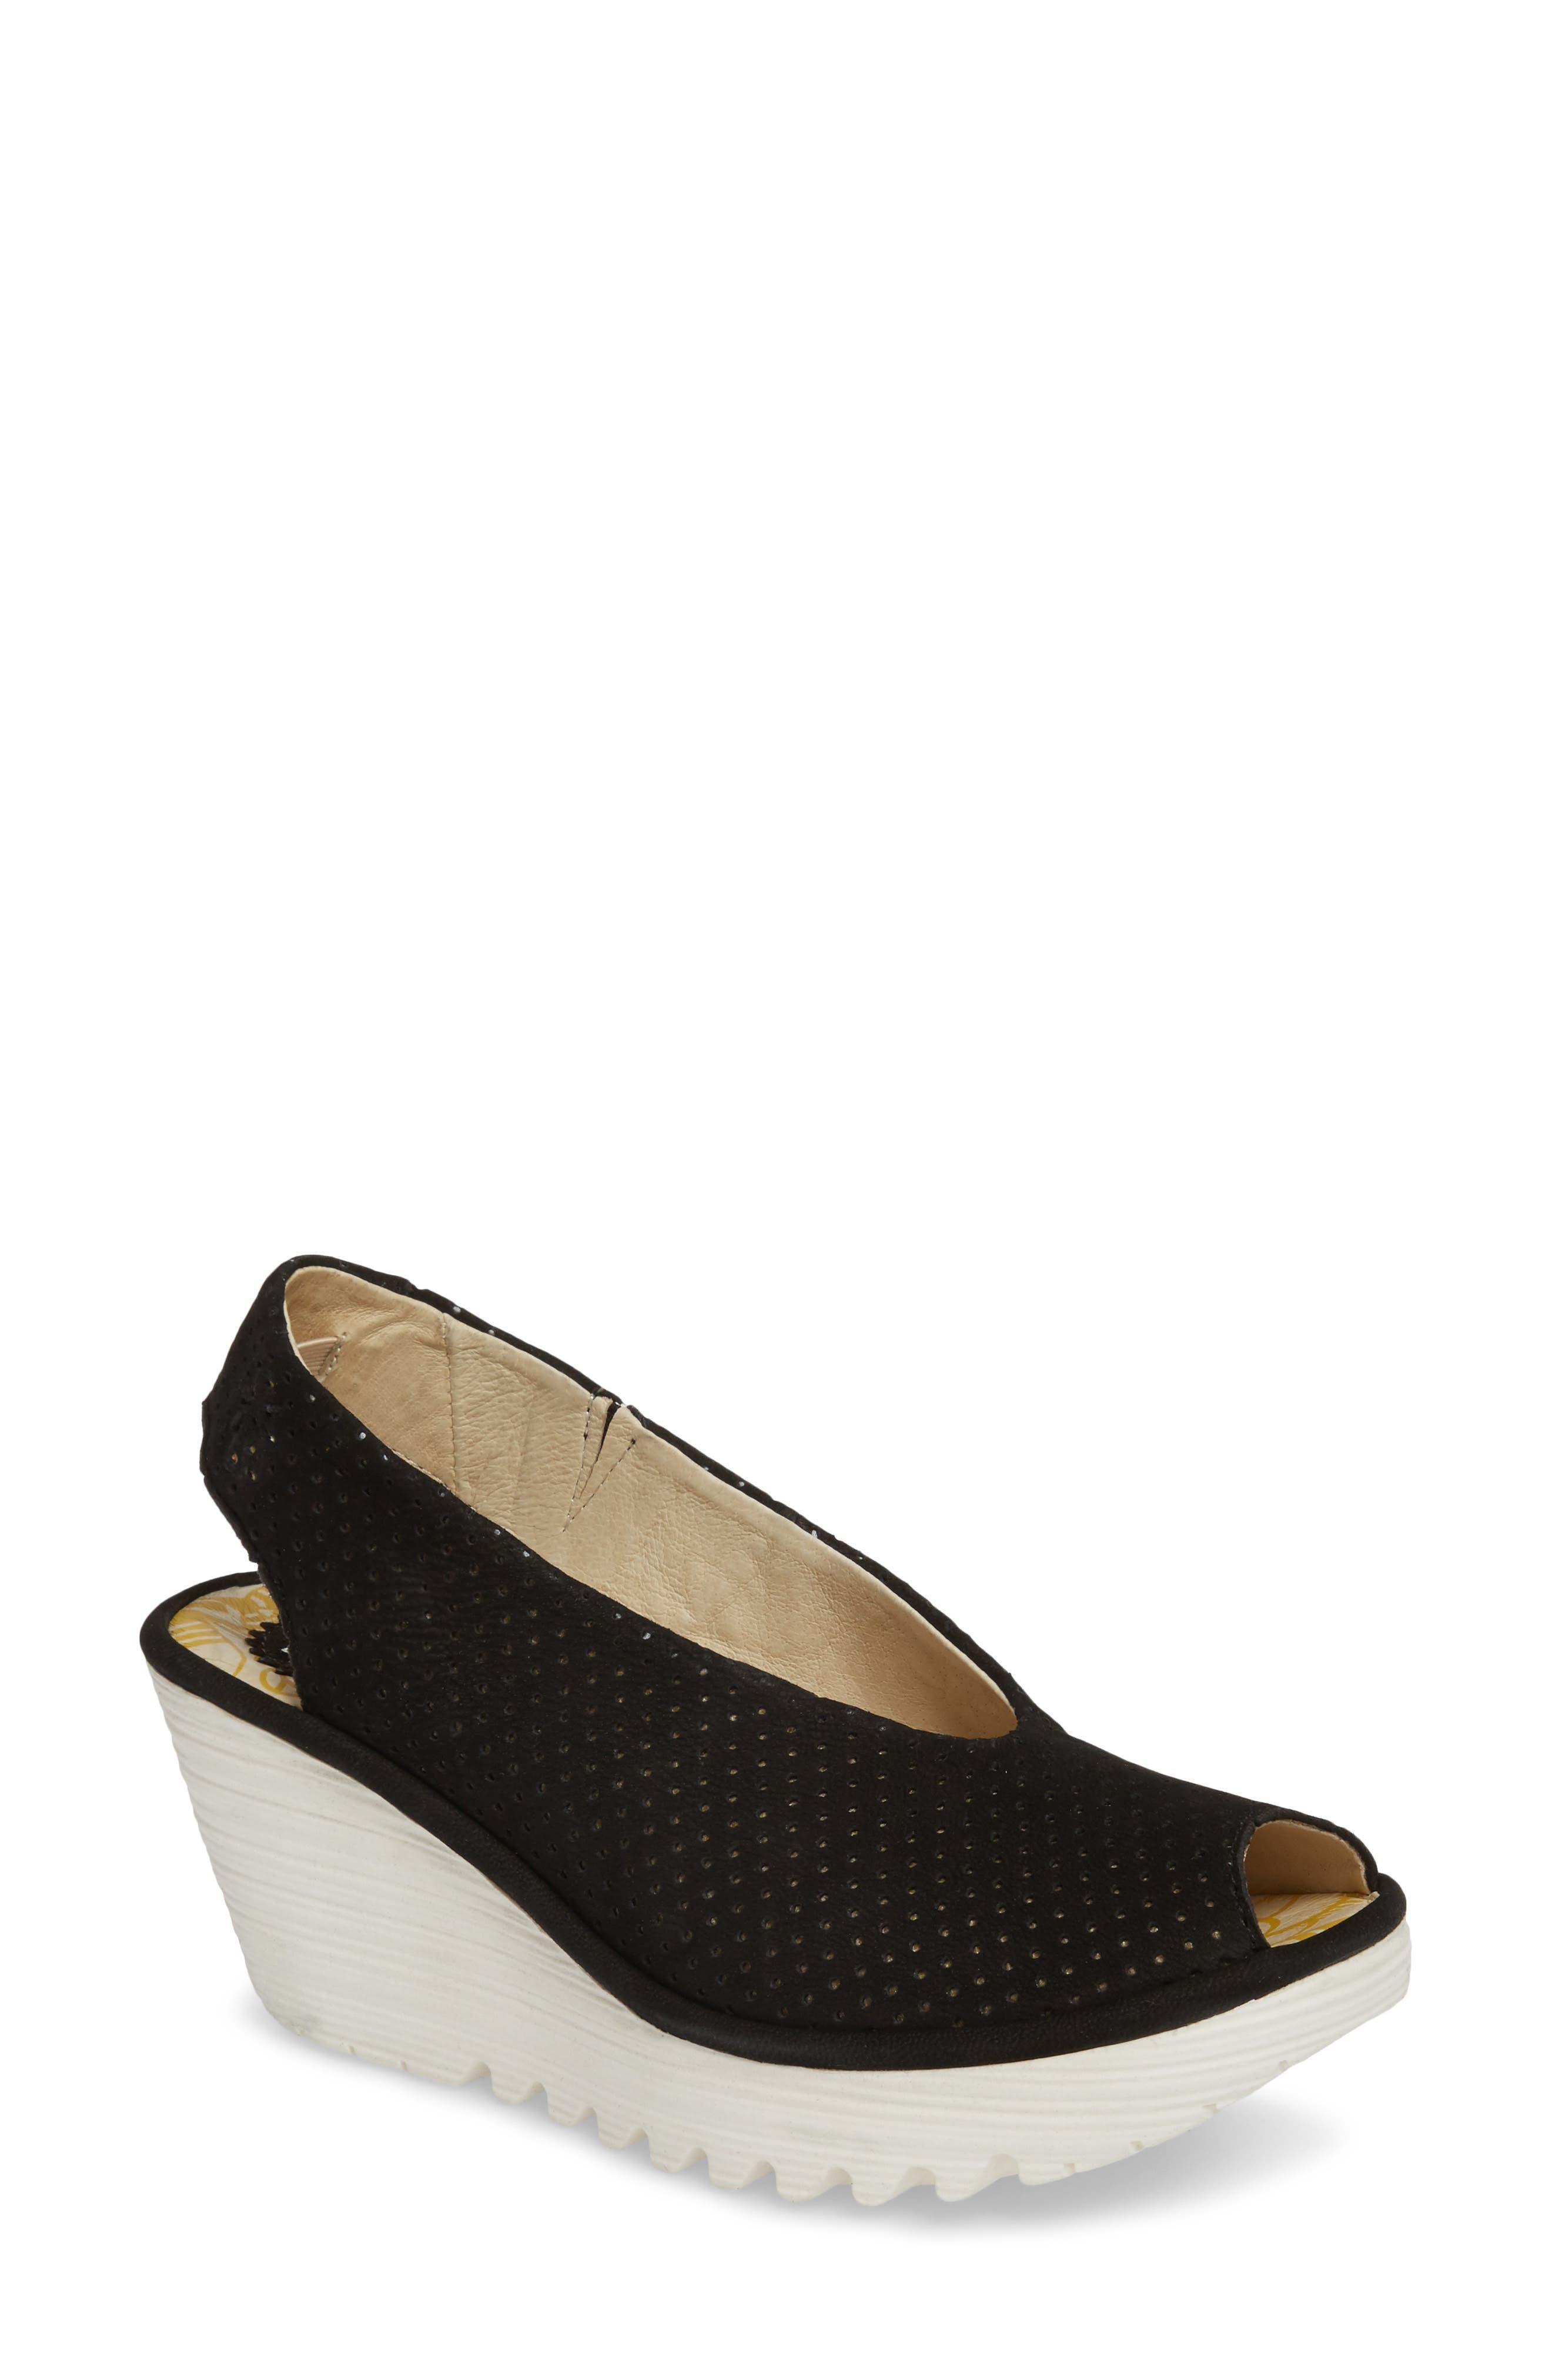 Yazu Wedge Sandal,                             Main thumbnail 1, color,                             BLACK/ BLACK LEATHER